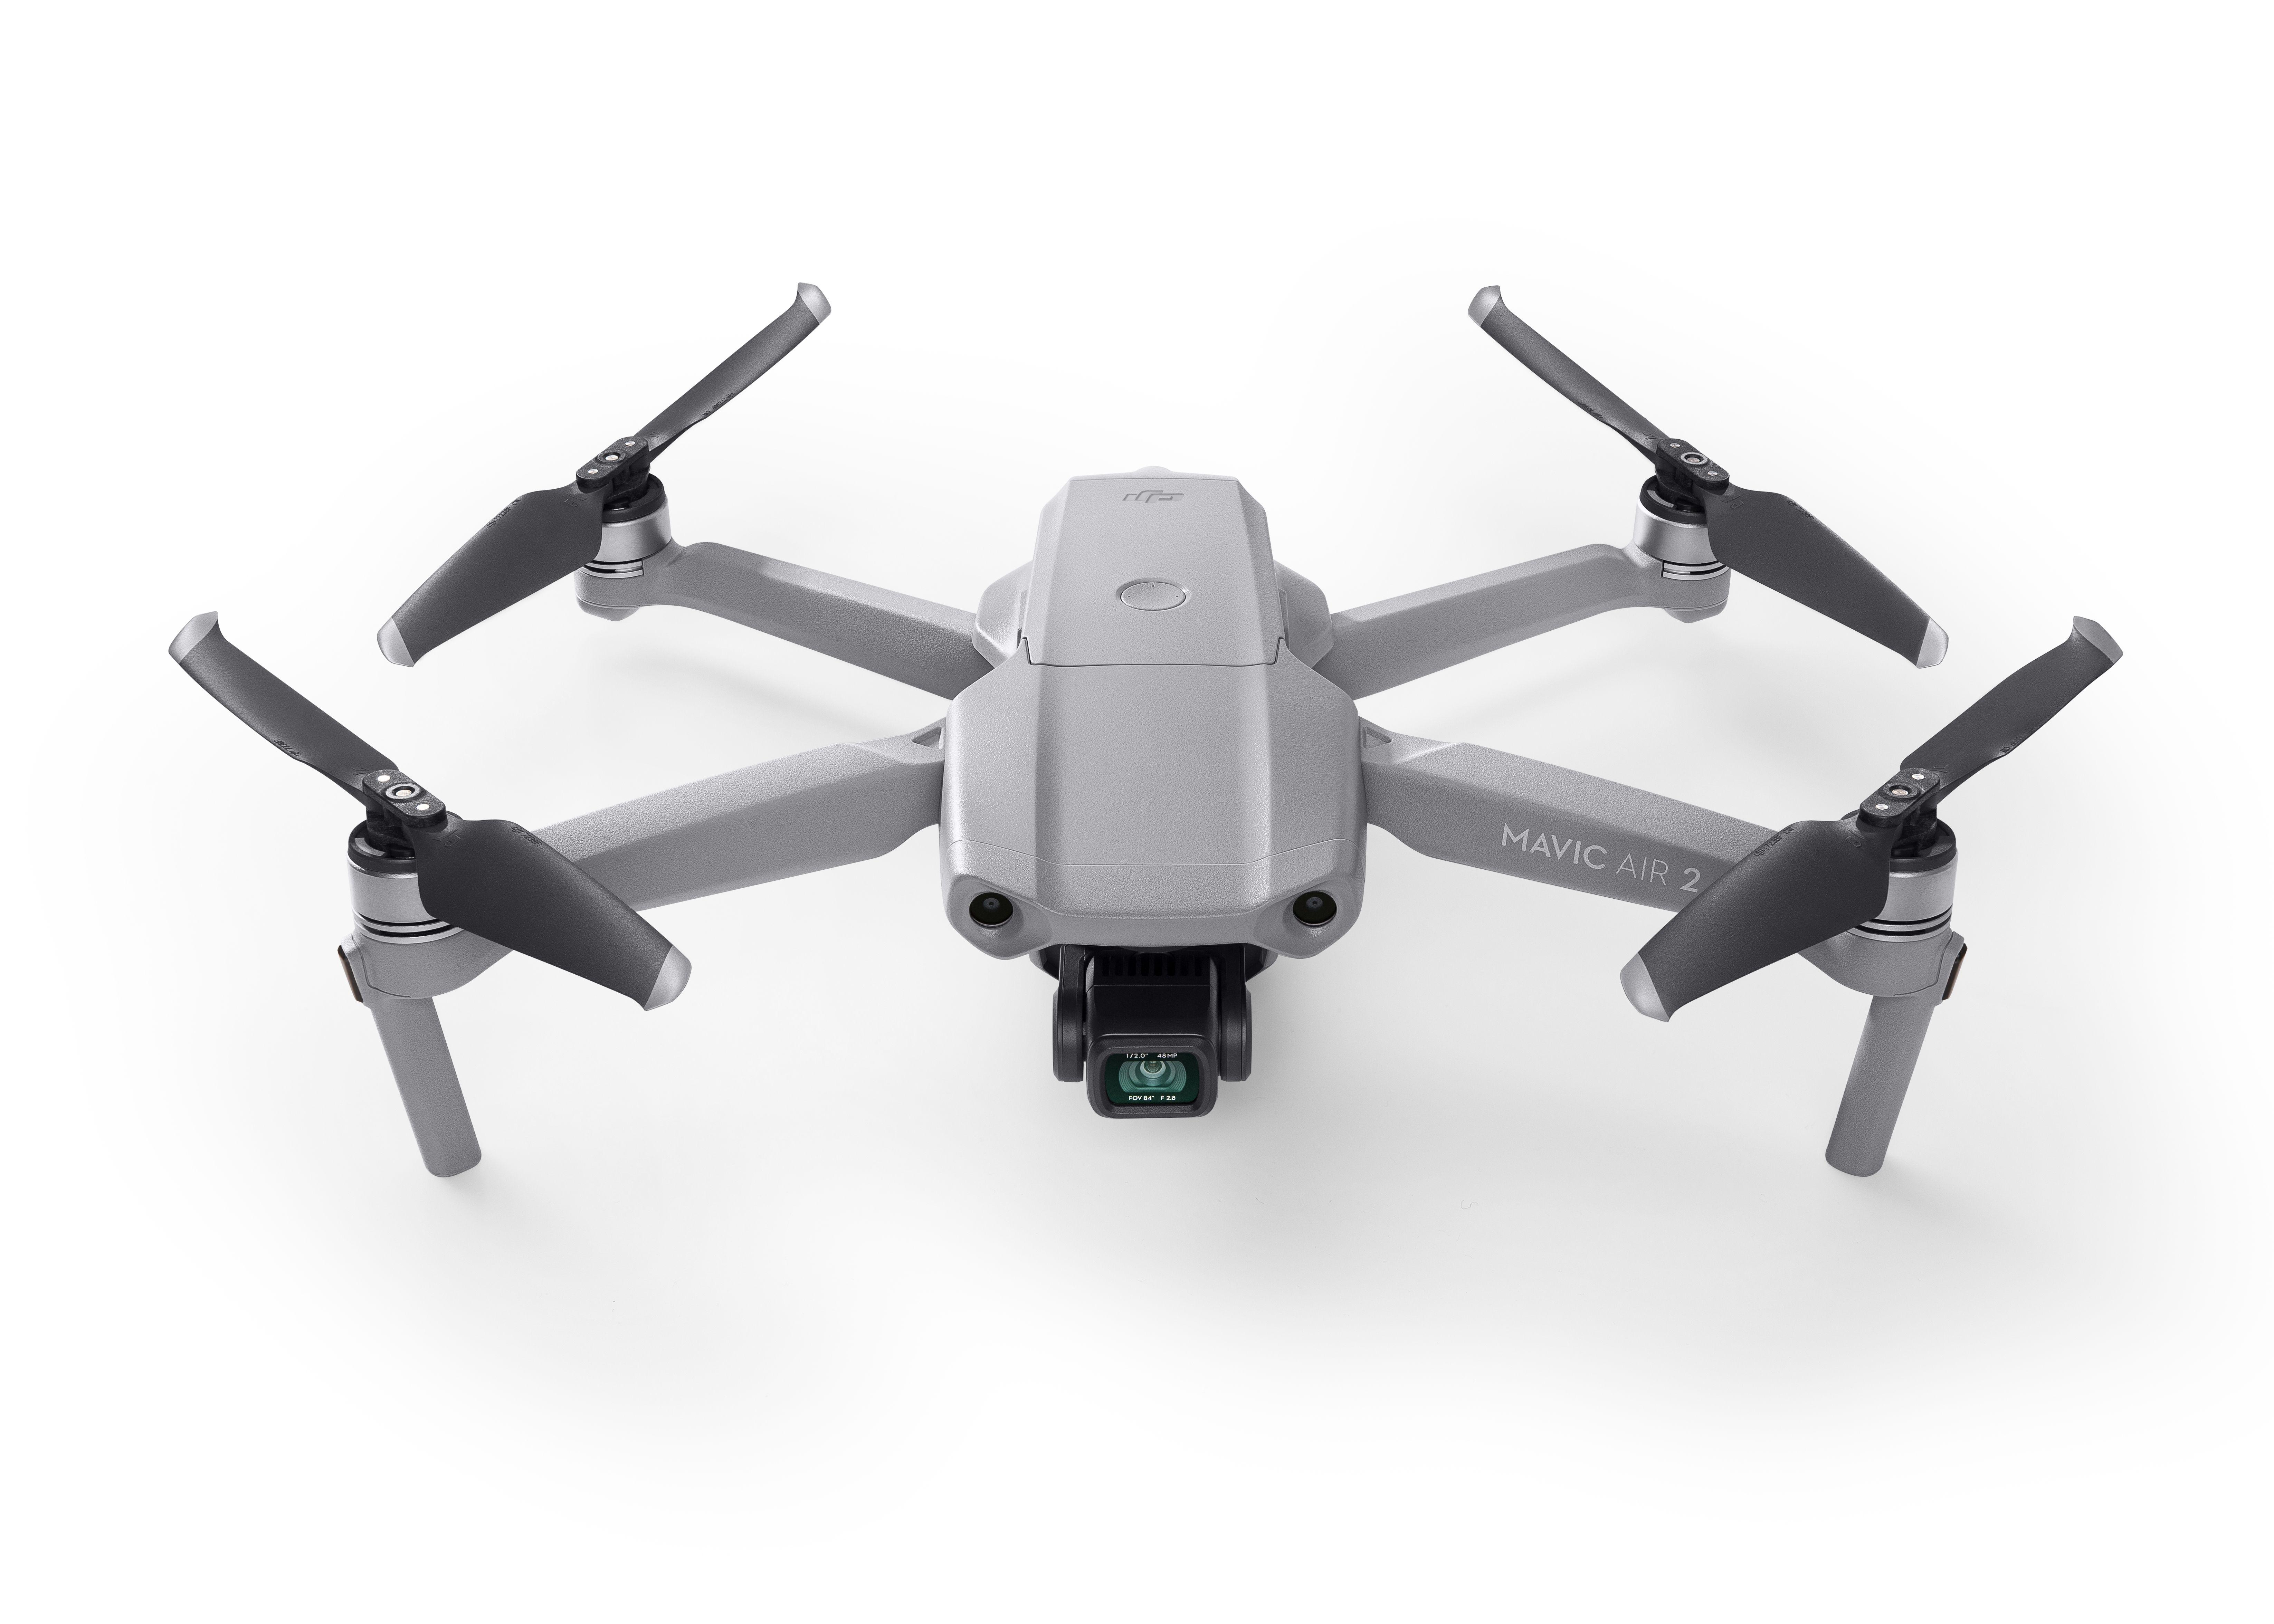 DJIs mini Mavic Air gets an upgrade with improved camera